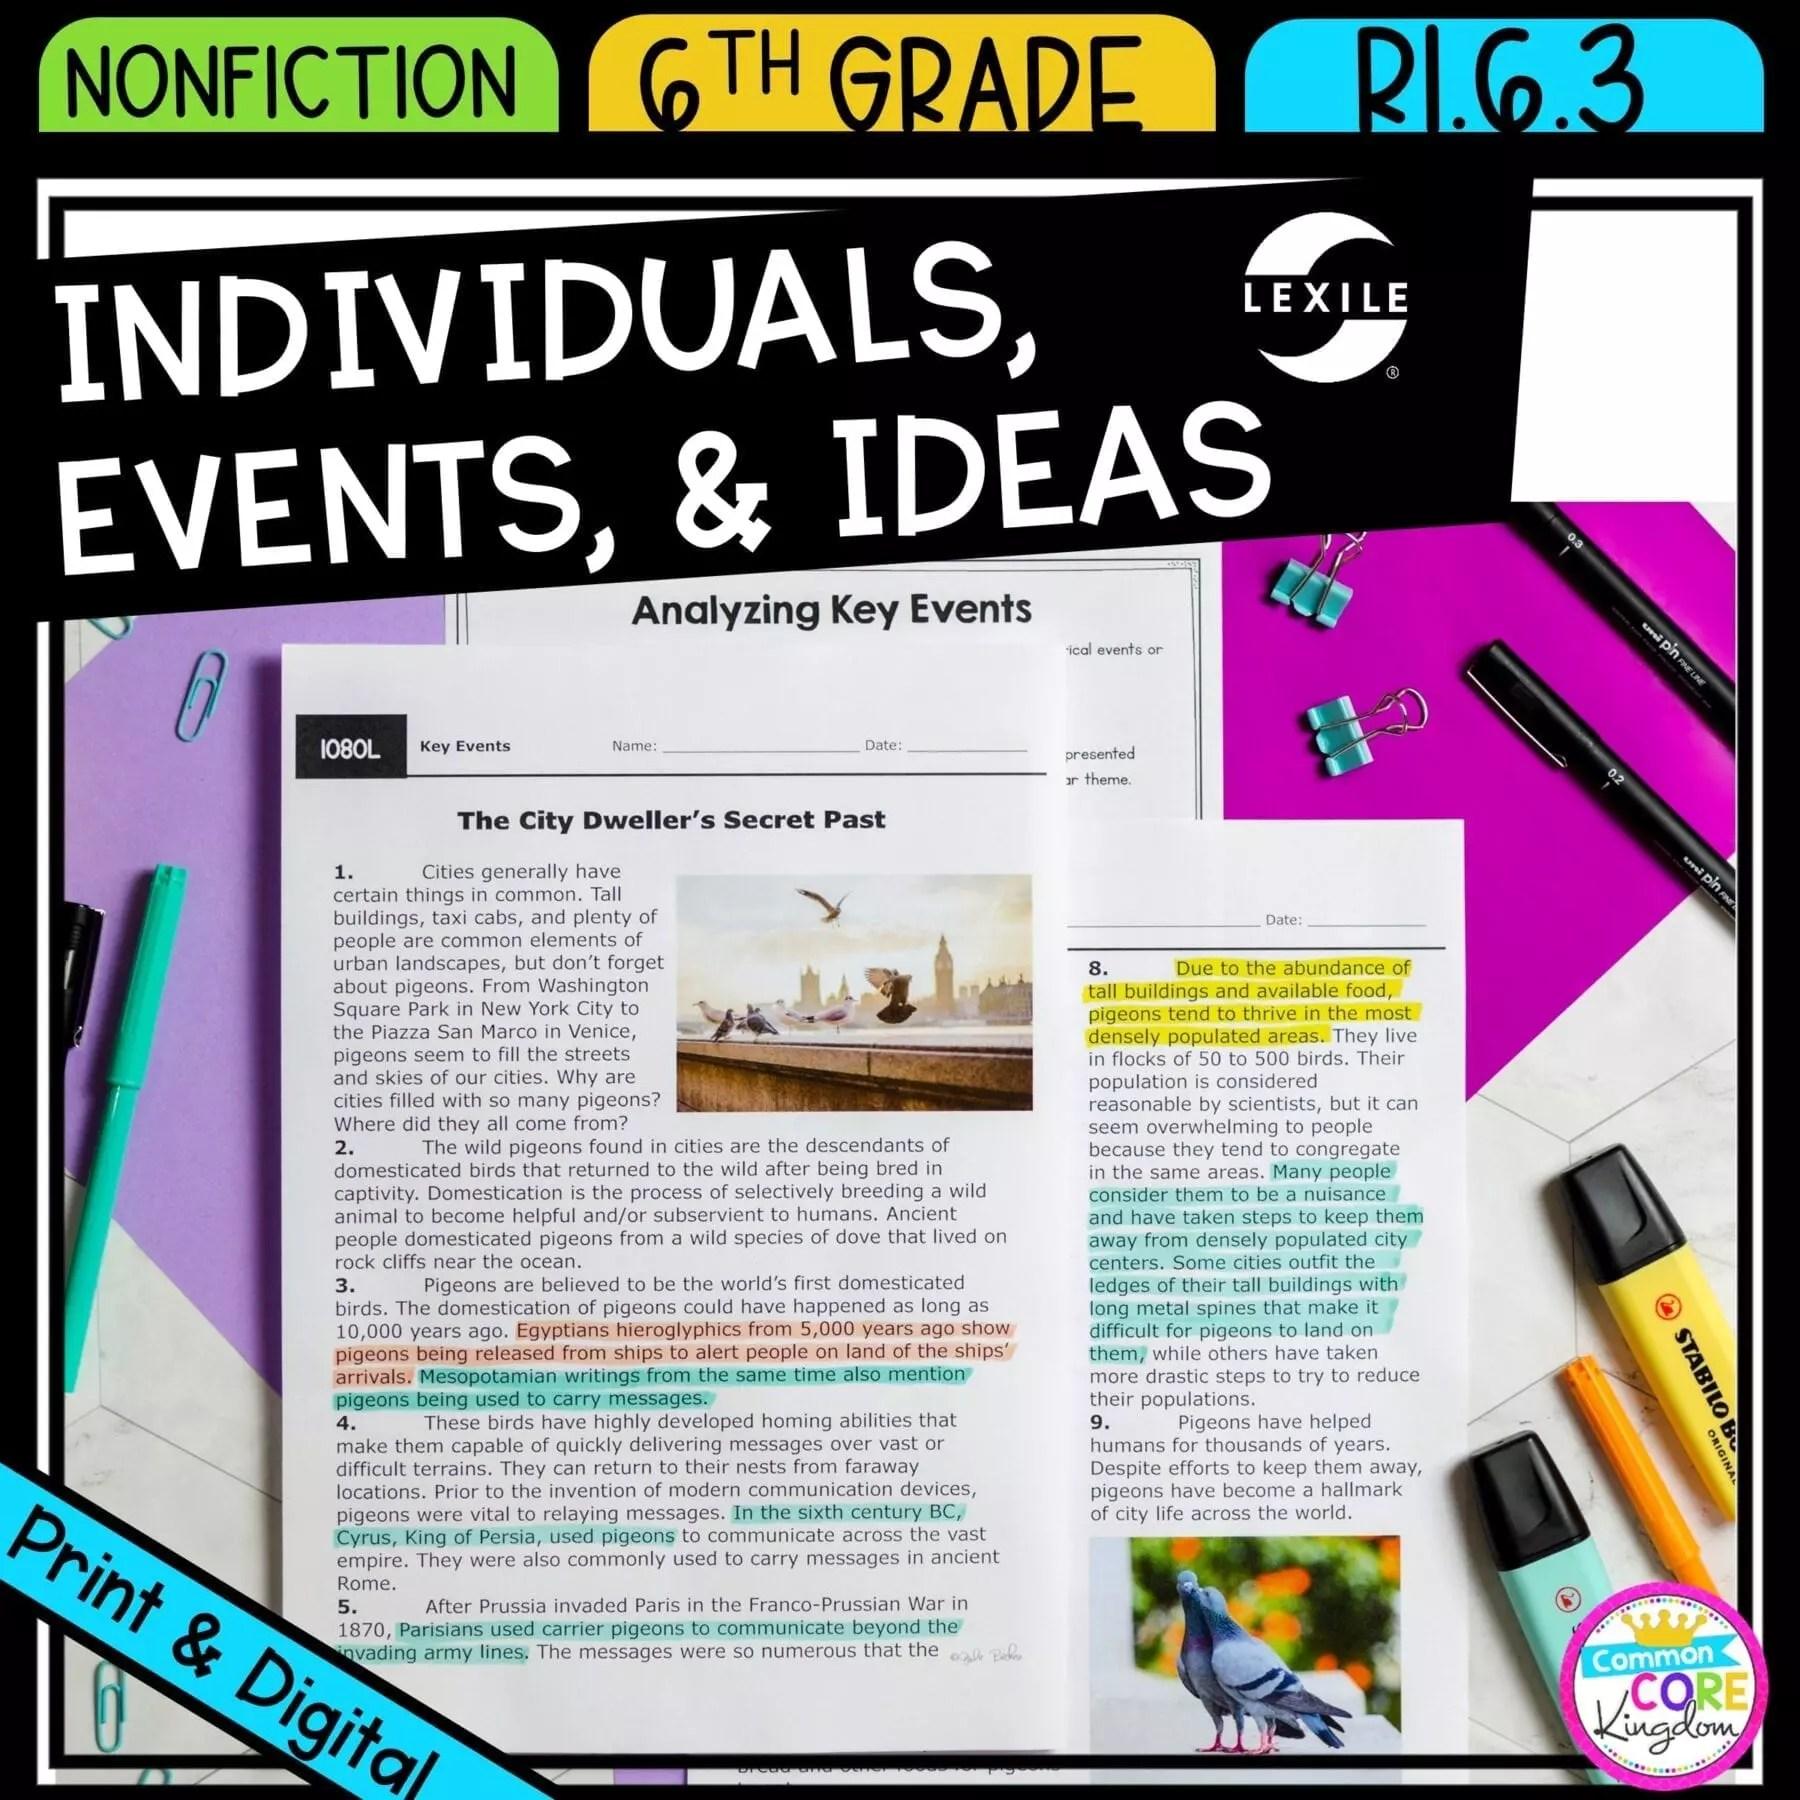 Key Individuals Events \u0026 Ideas 6th Grade RI.6.3   Common Core Kingdom [ 1800 x 1800 Pixel ]